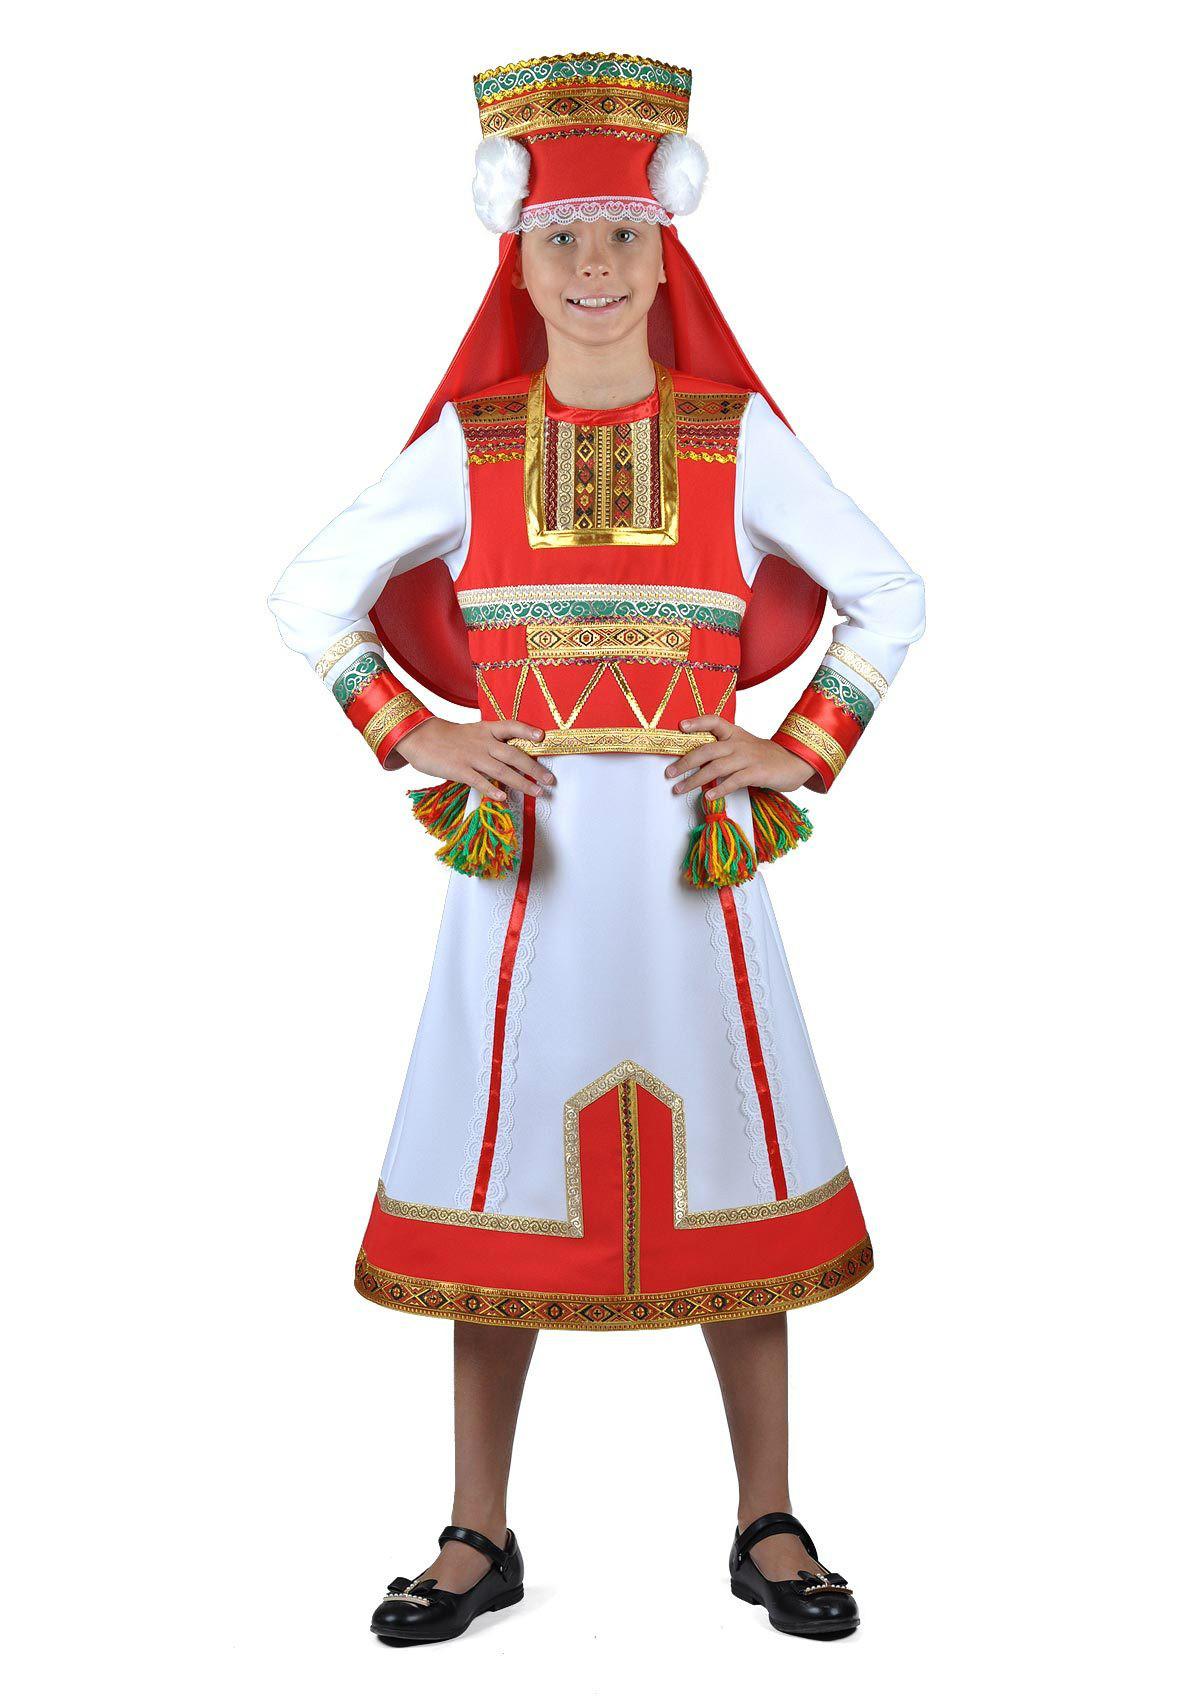 иван мордовский костюм женский картинки рисунок вздумайте